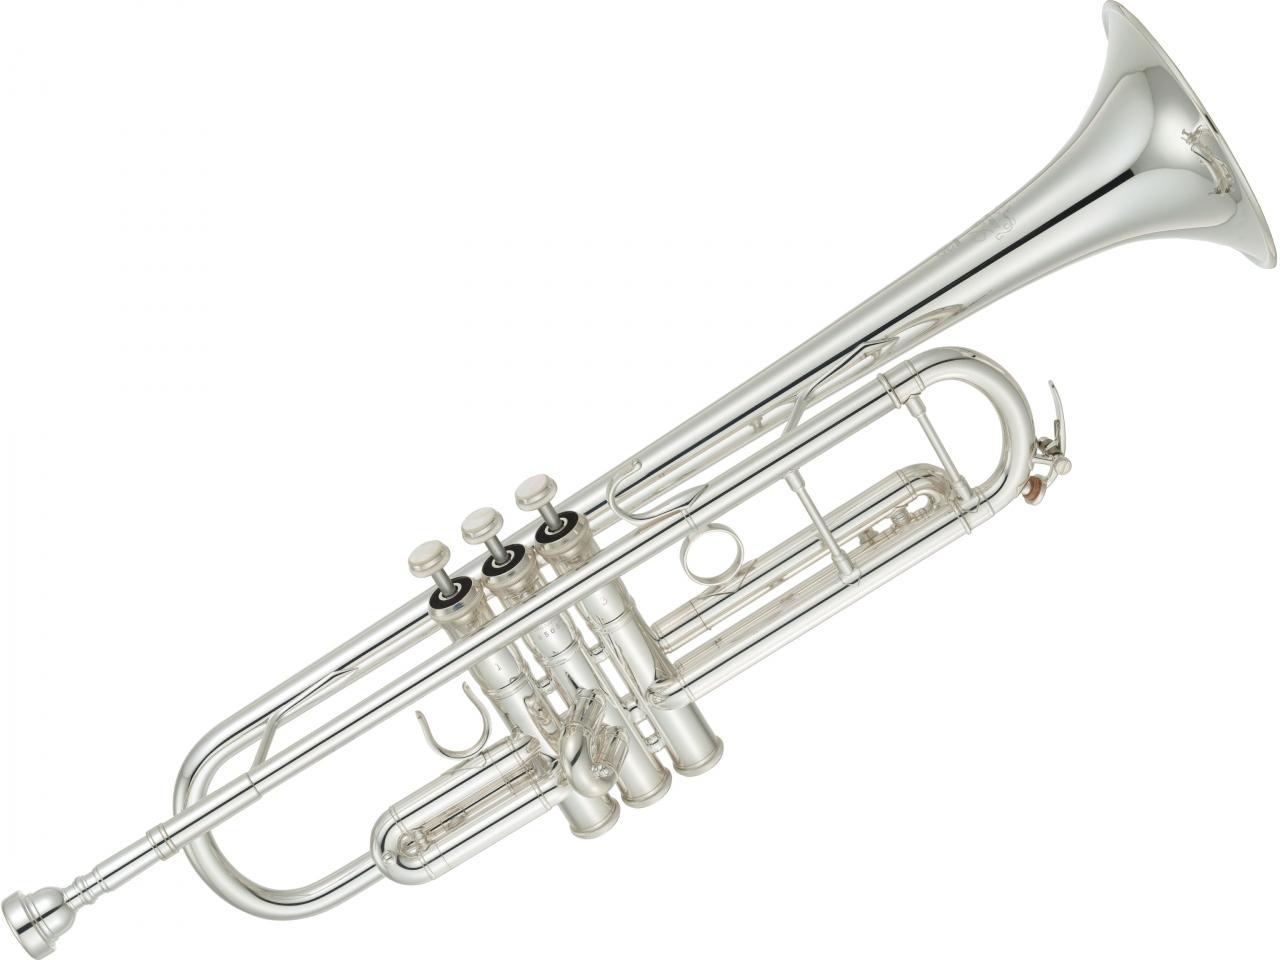 Yamaha Ytr Chs 04 Trompete Xeno Artist